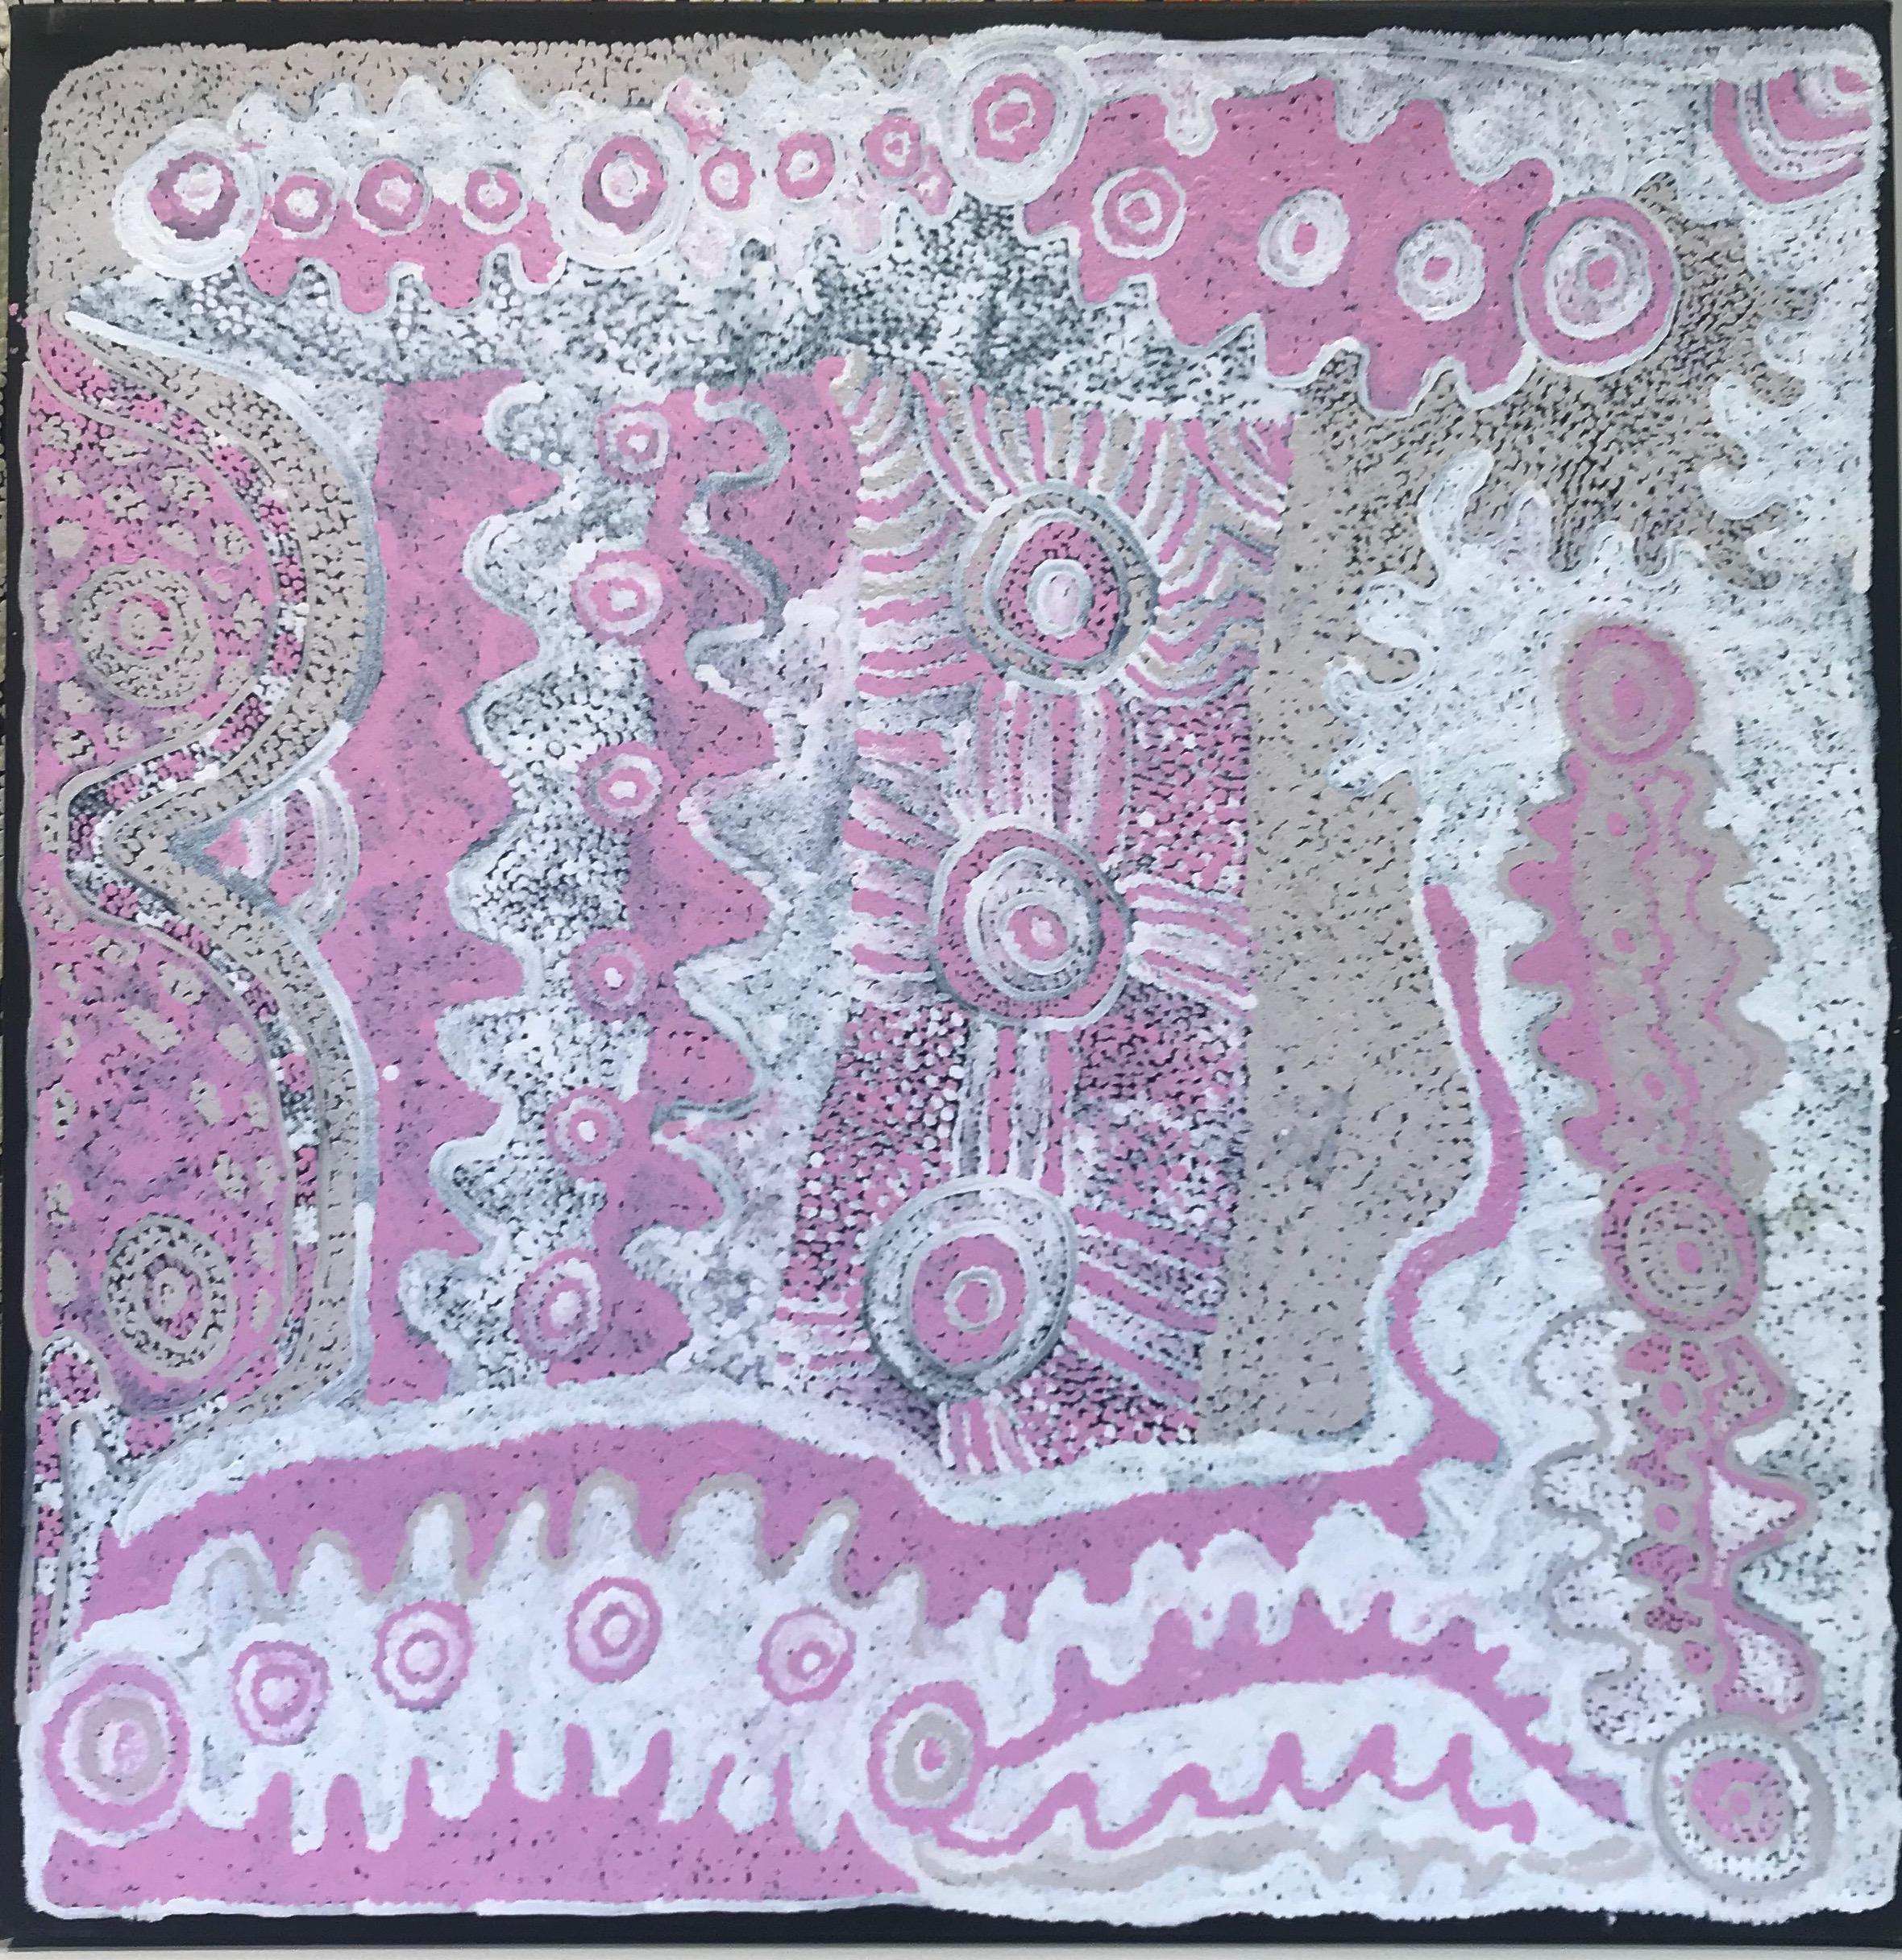 "Pantjiti Lionel  Malara  Acrylic on canvas 39"" x 39"" (100 x 100 cm) Ernabella Arts Catalog #58-13   EMAIL INQUIRY"